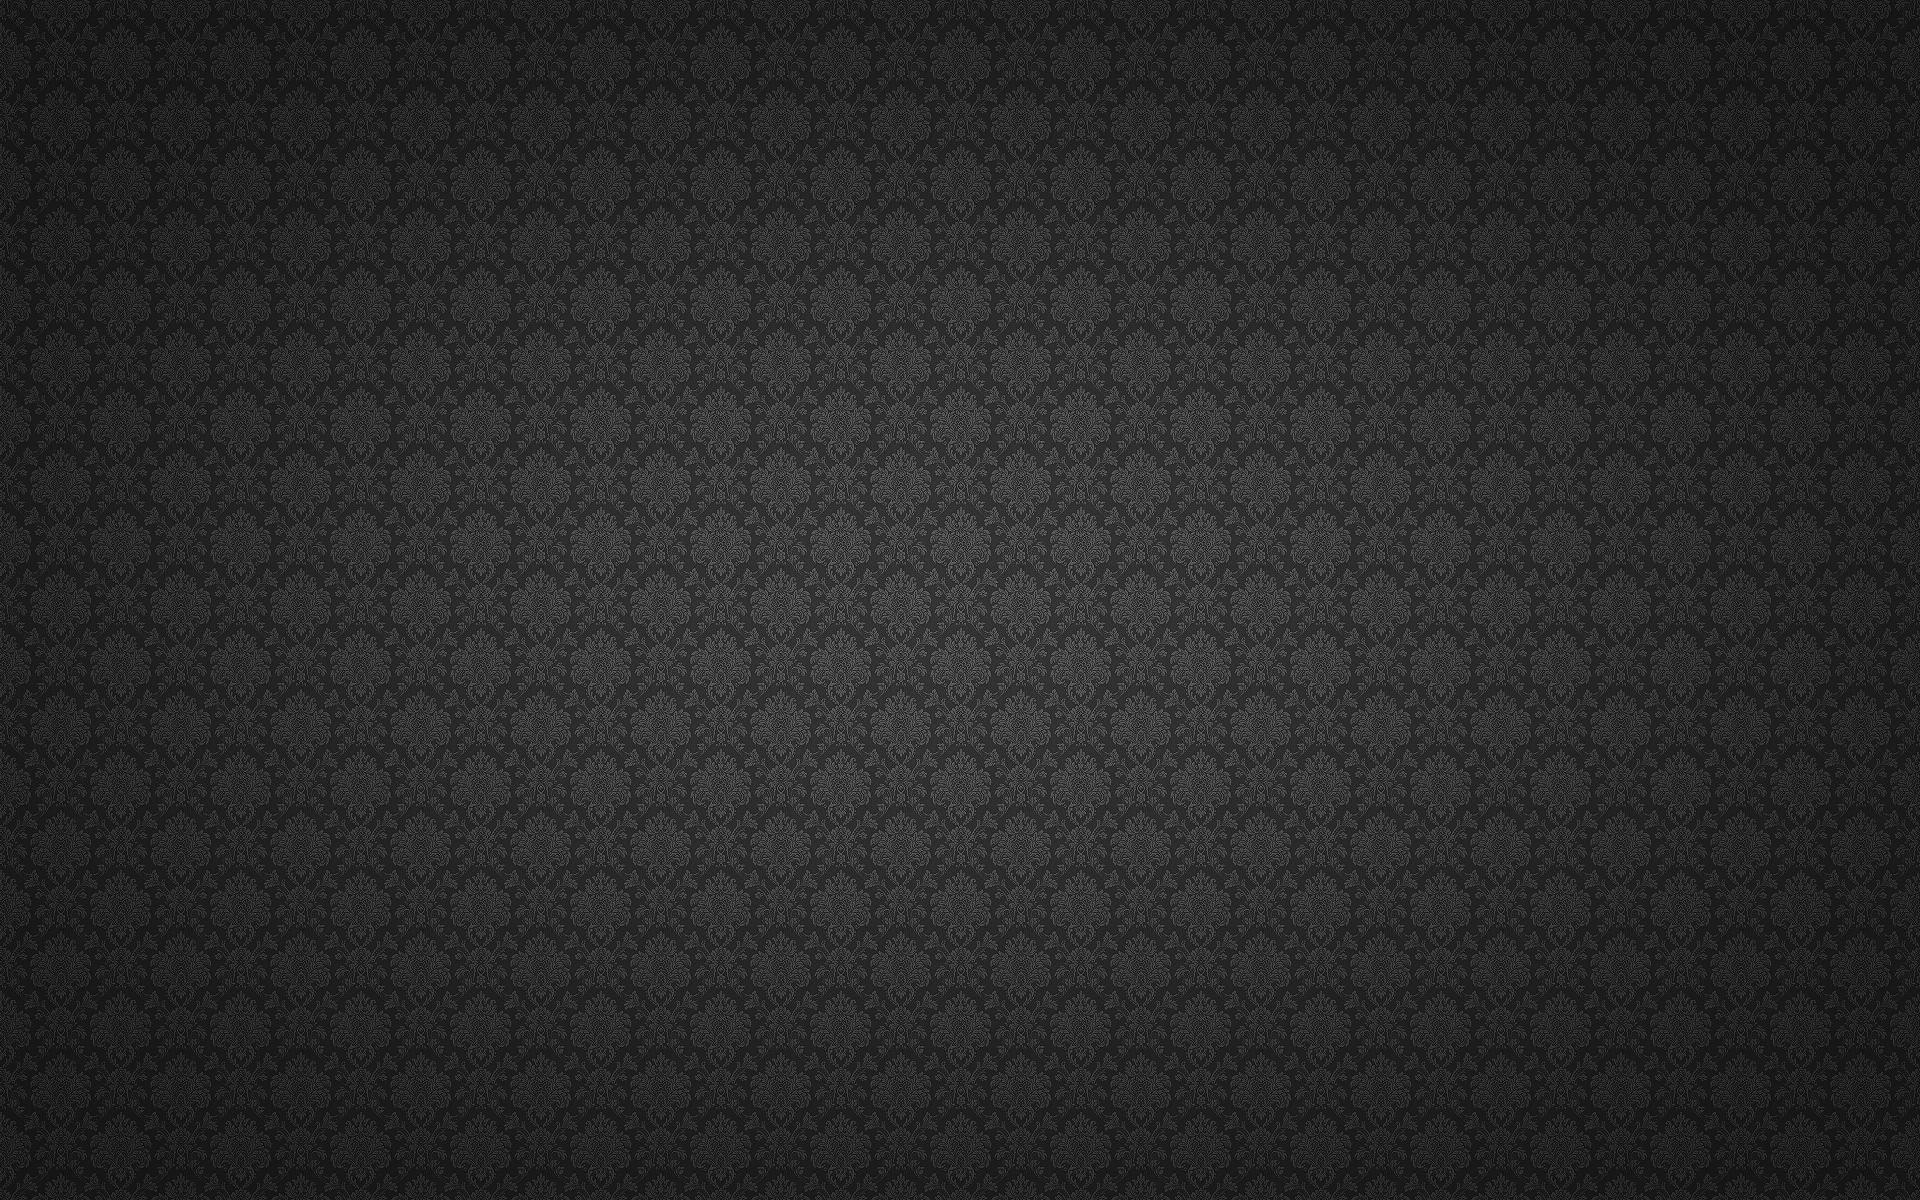 Black Wallpaper 22 1920x1200